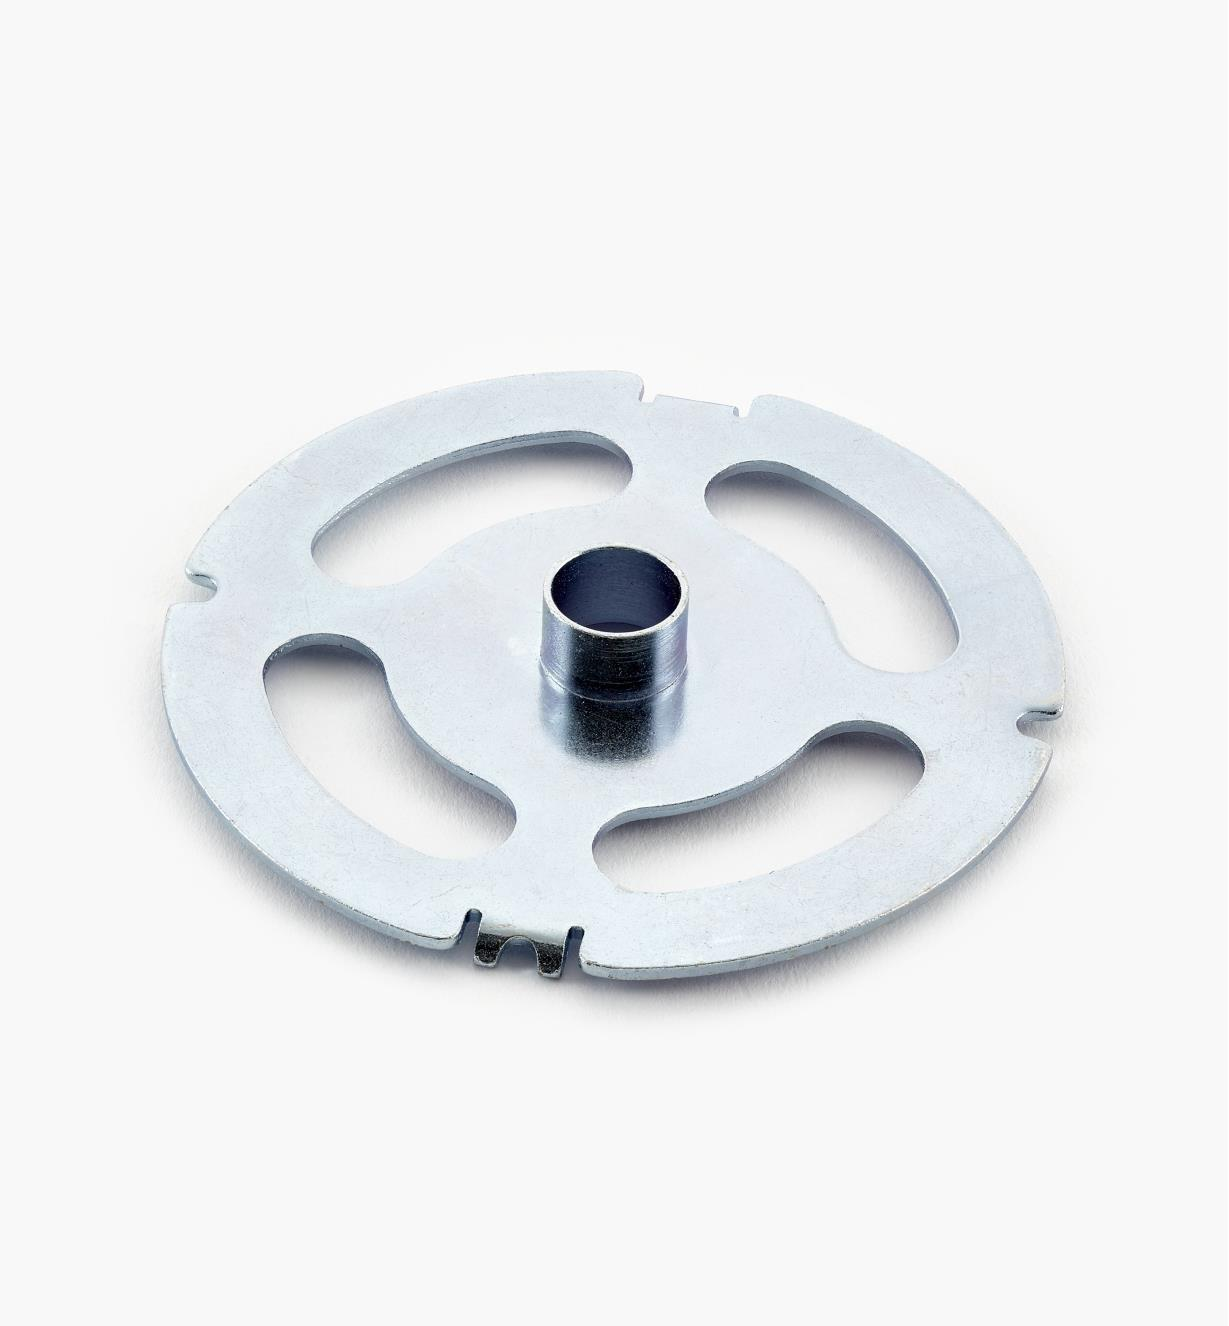 ZA494622 - Bague de copiage, 17 mm